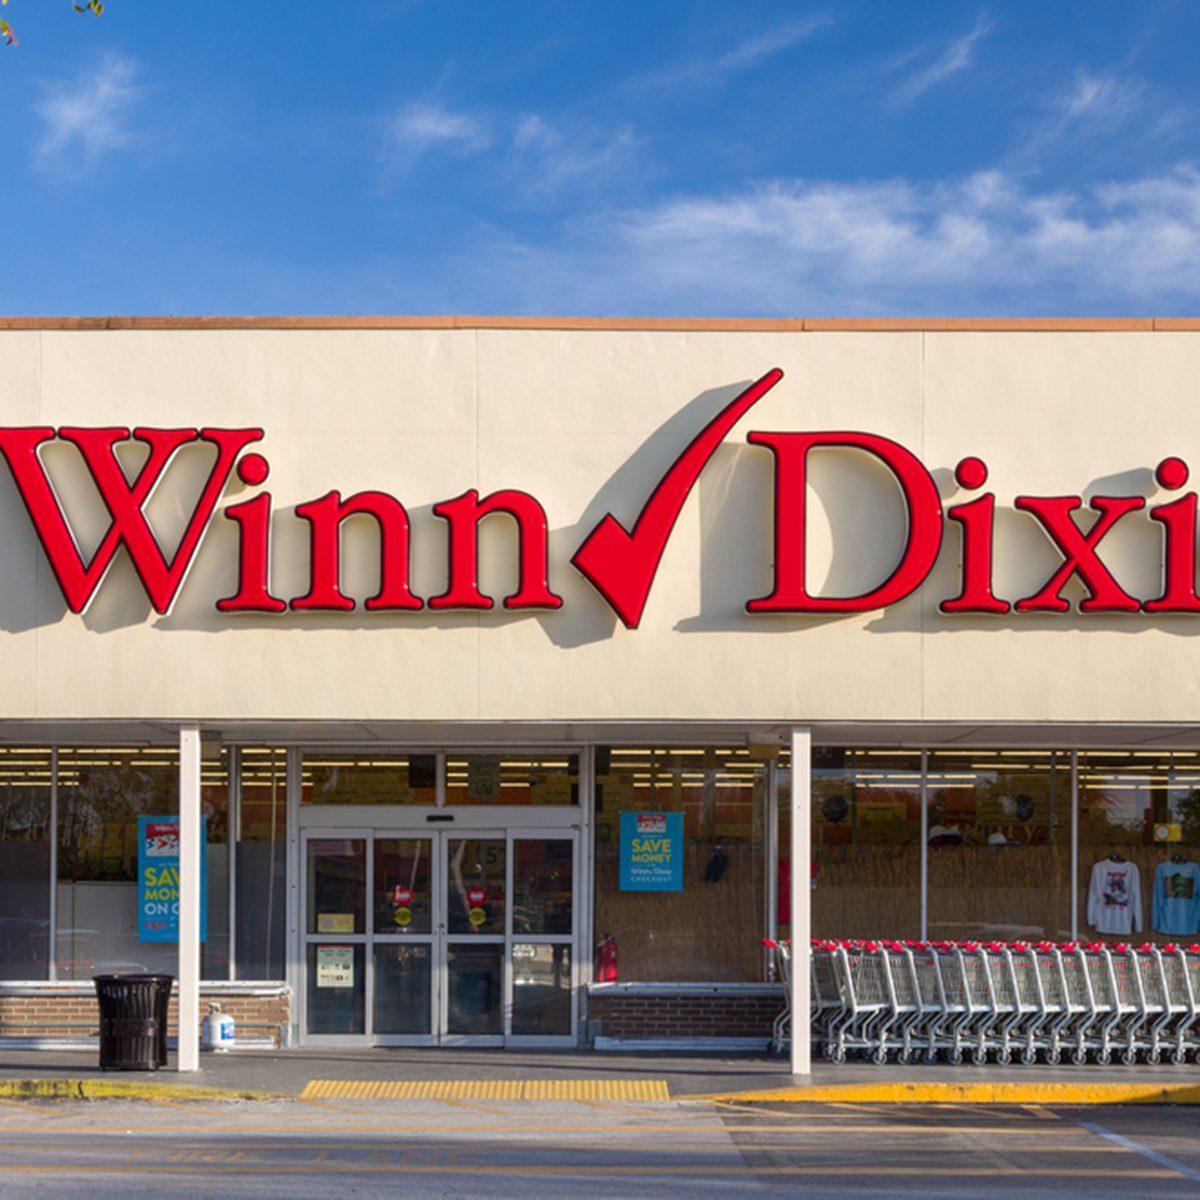 Winn-Dixie retail grocery store exterior.